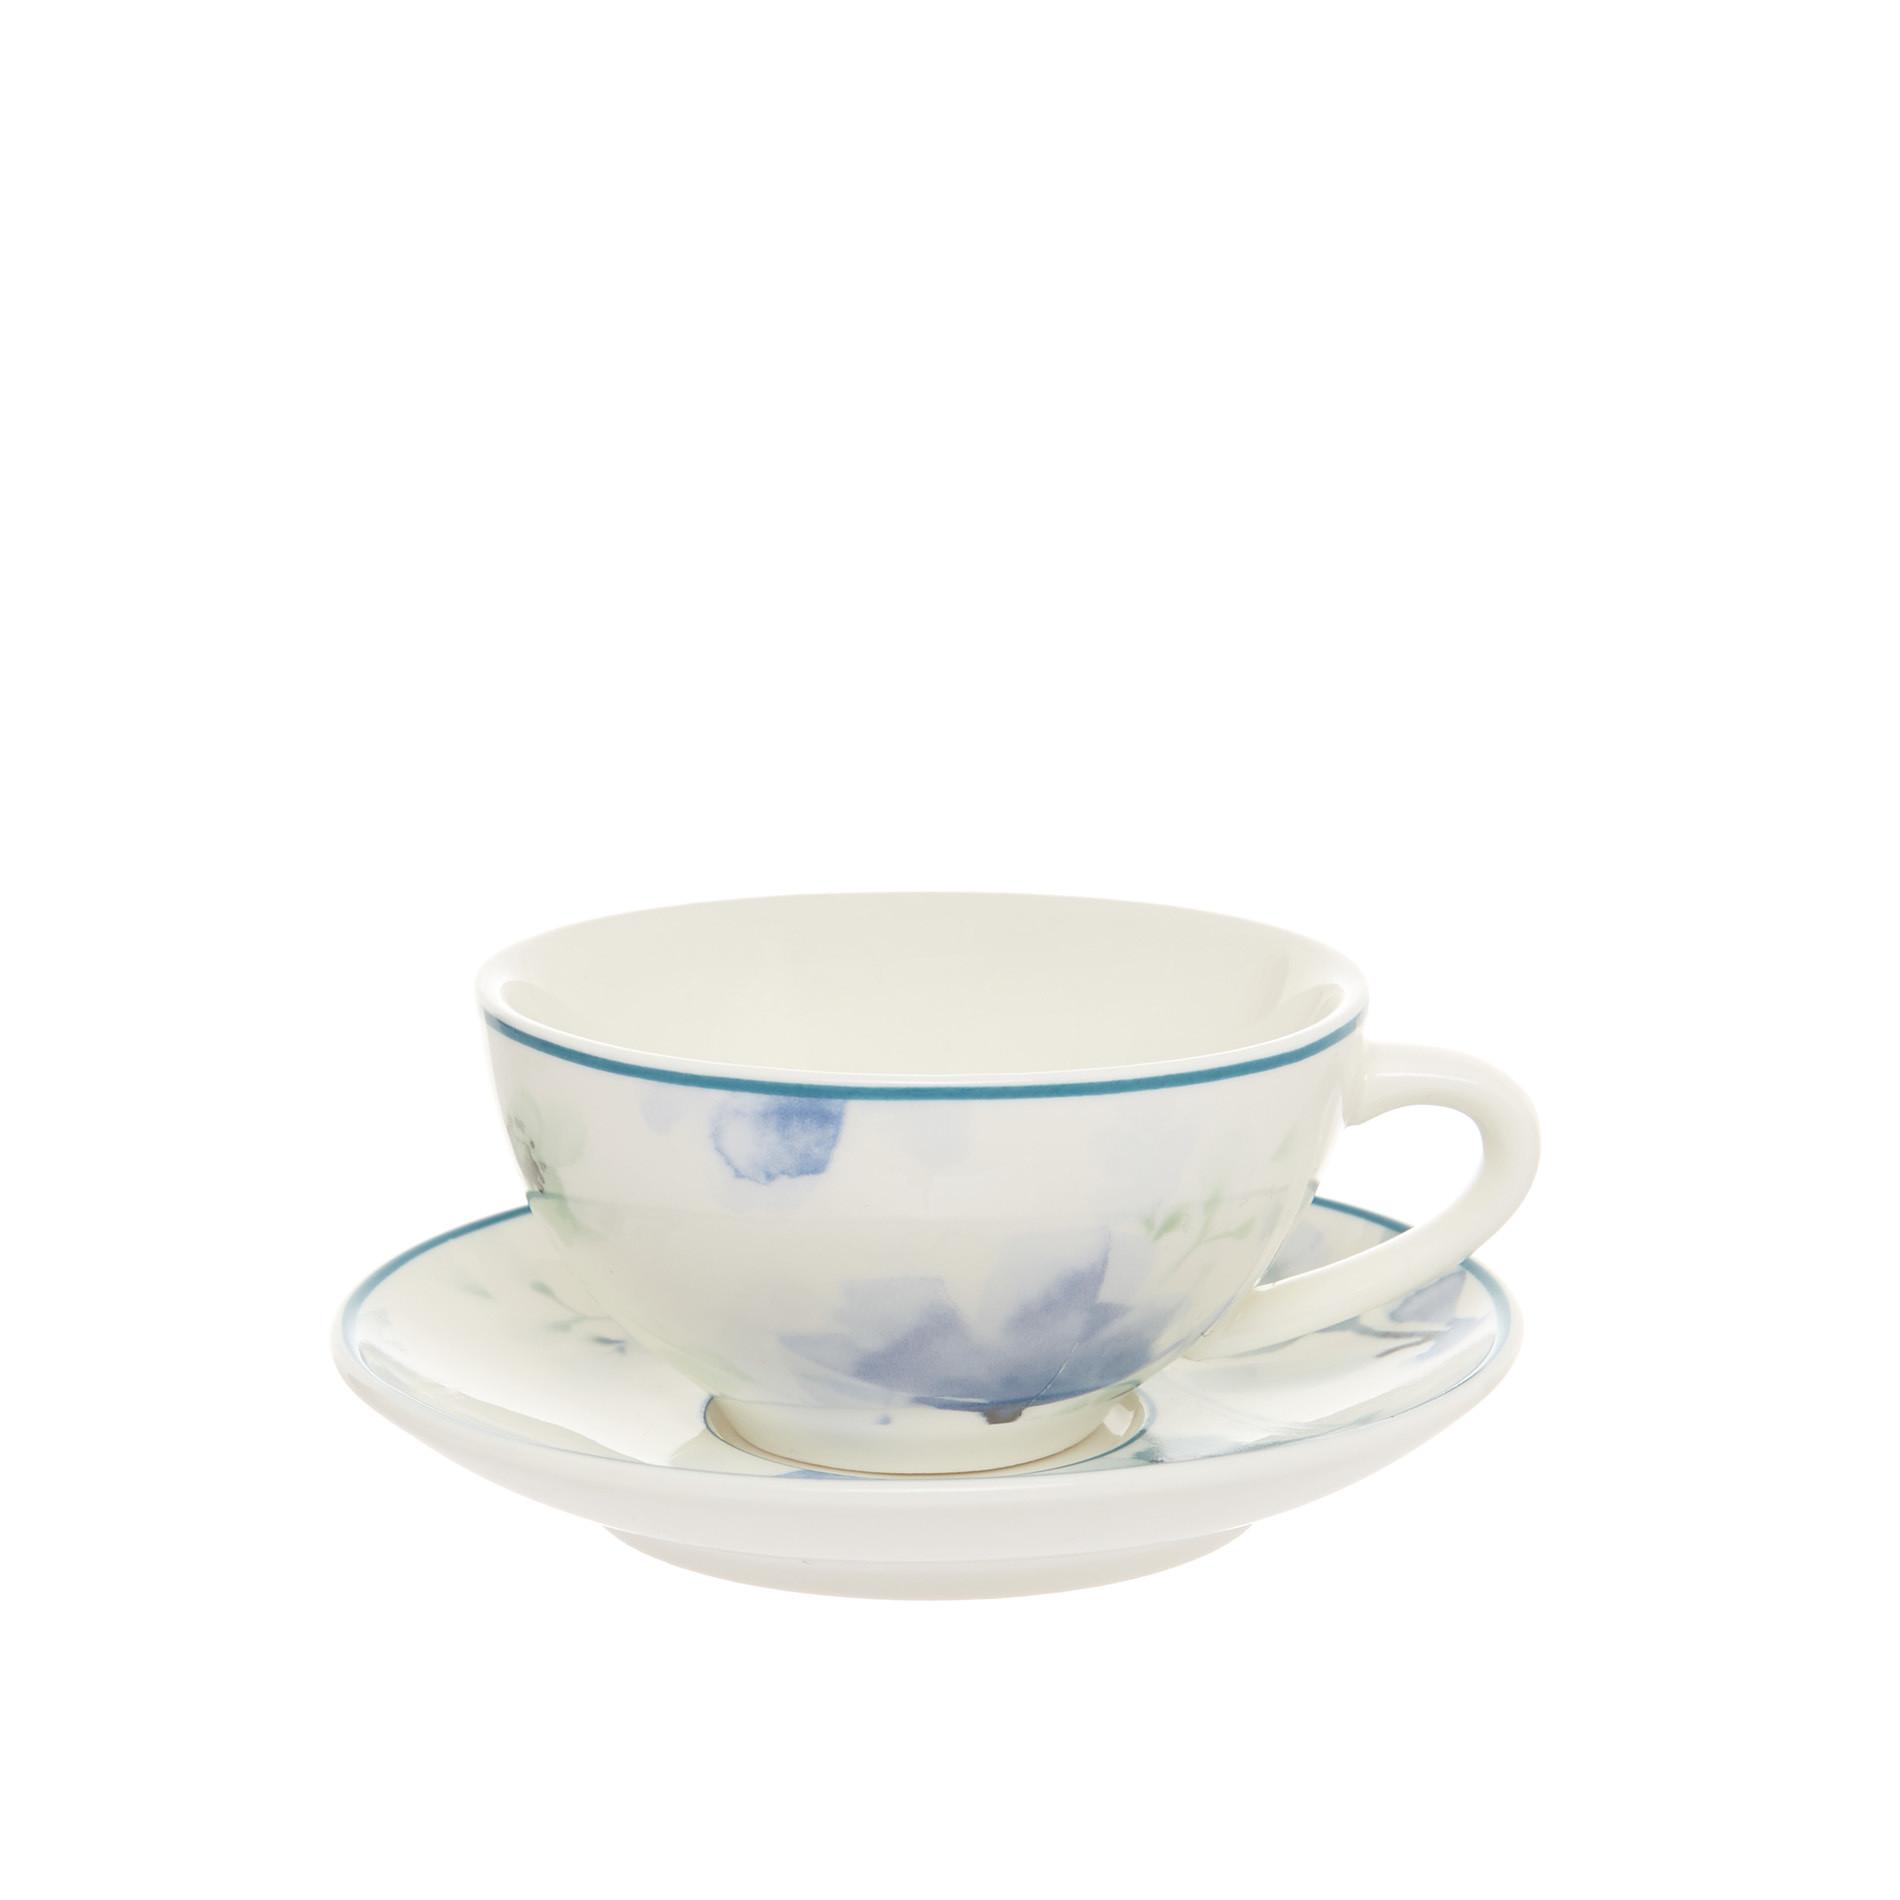 Tazza da caffe new bone china motivo floreale, Bianco panna, large image number 0